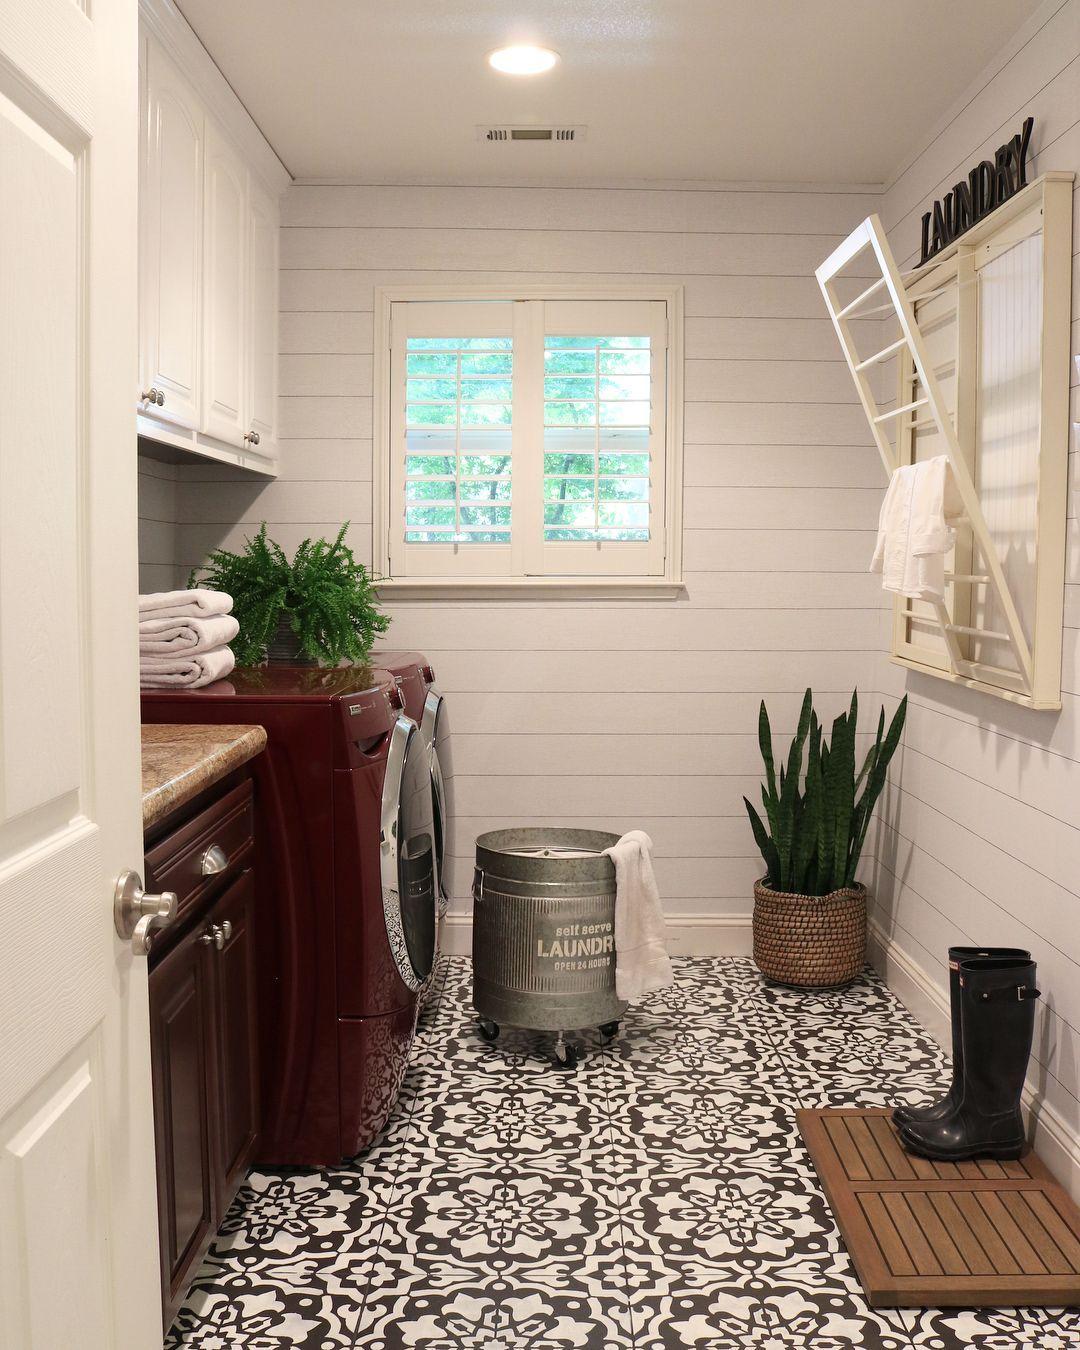 Pin On Laundry Room Cabinets Ideas Laundry room floor ideas